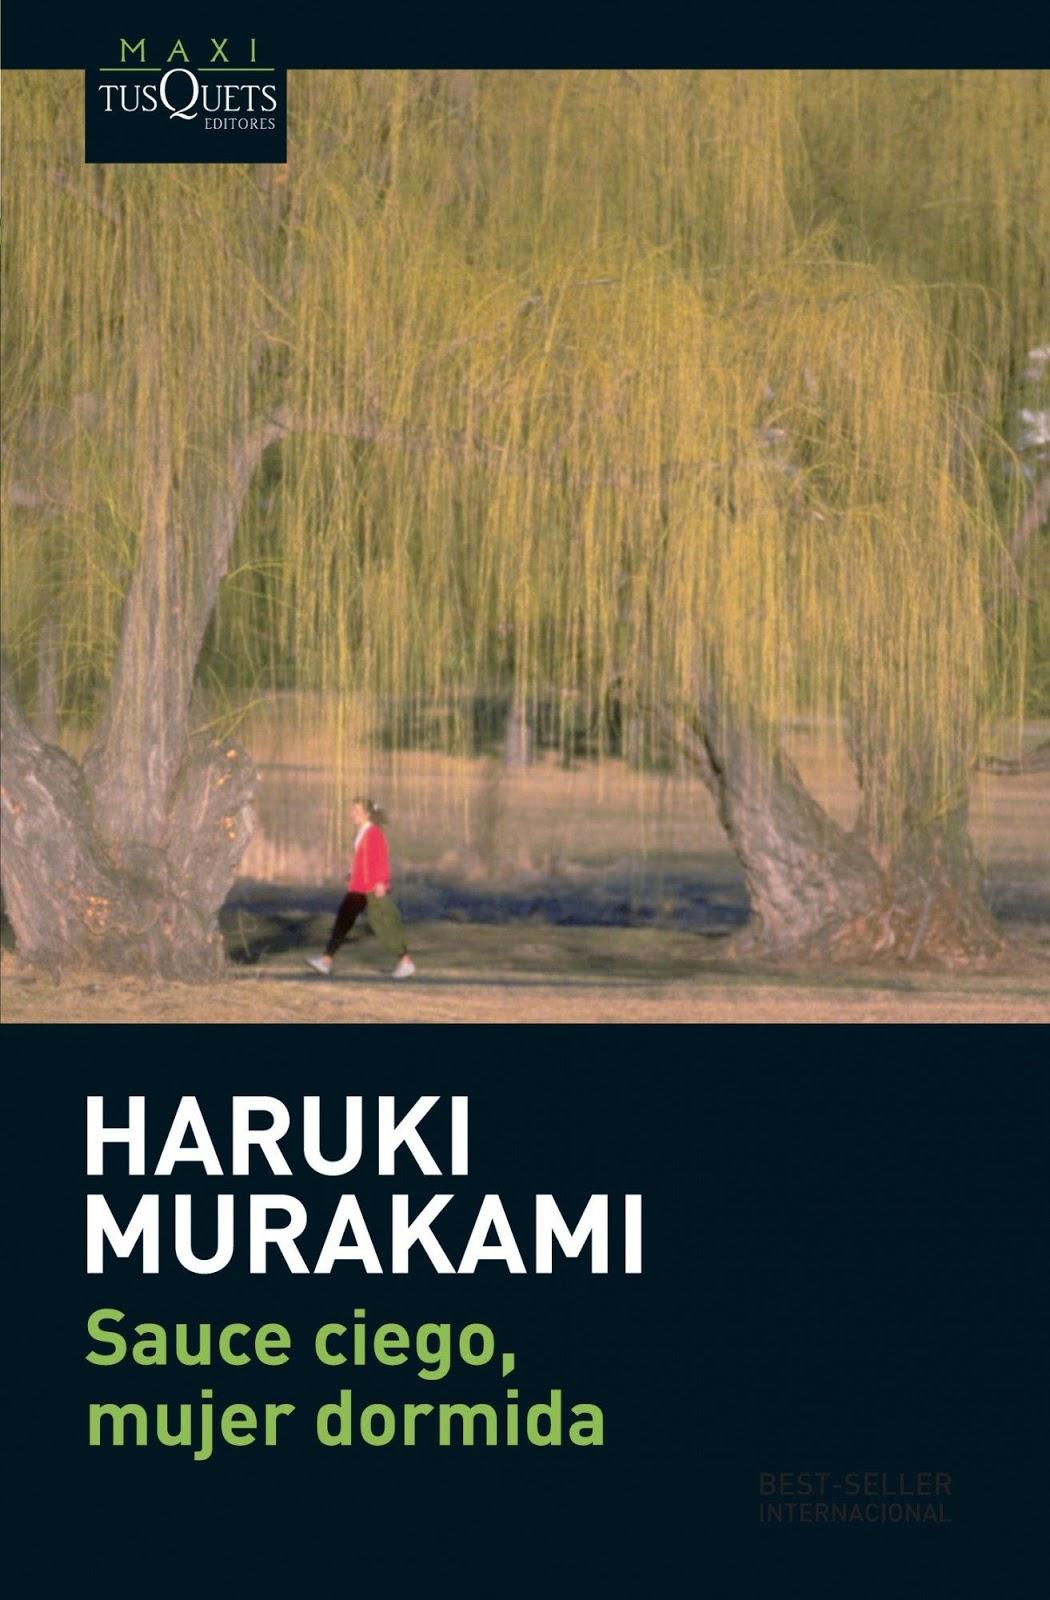 De Haruki Murakami